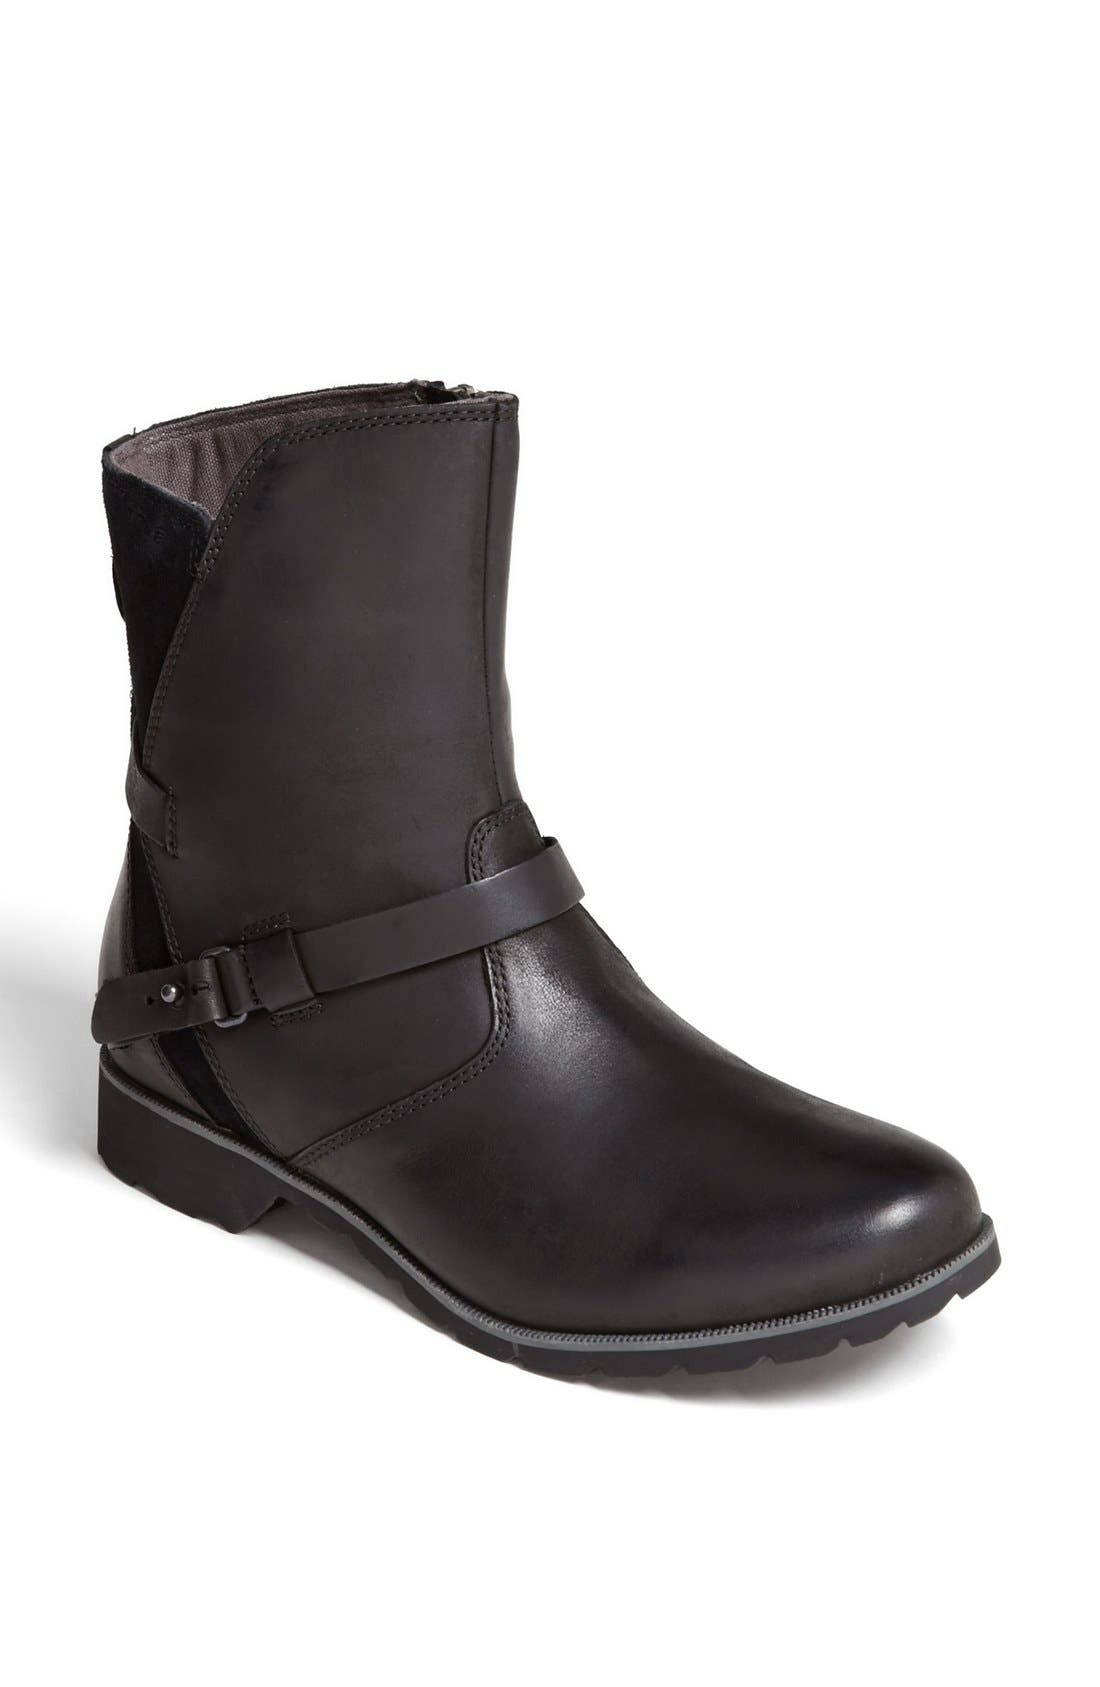 Main Image - Teva 'De La Vina' Boot